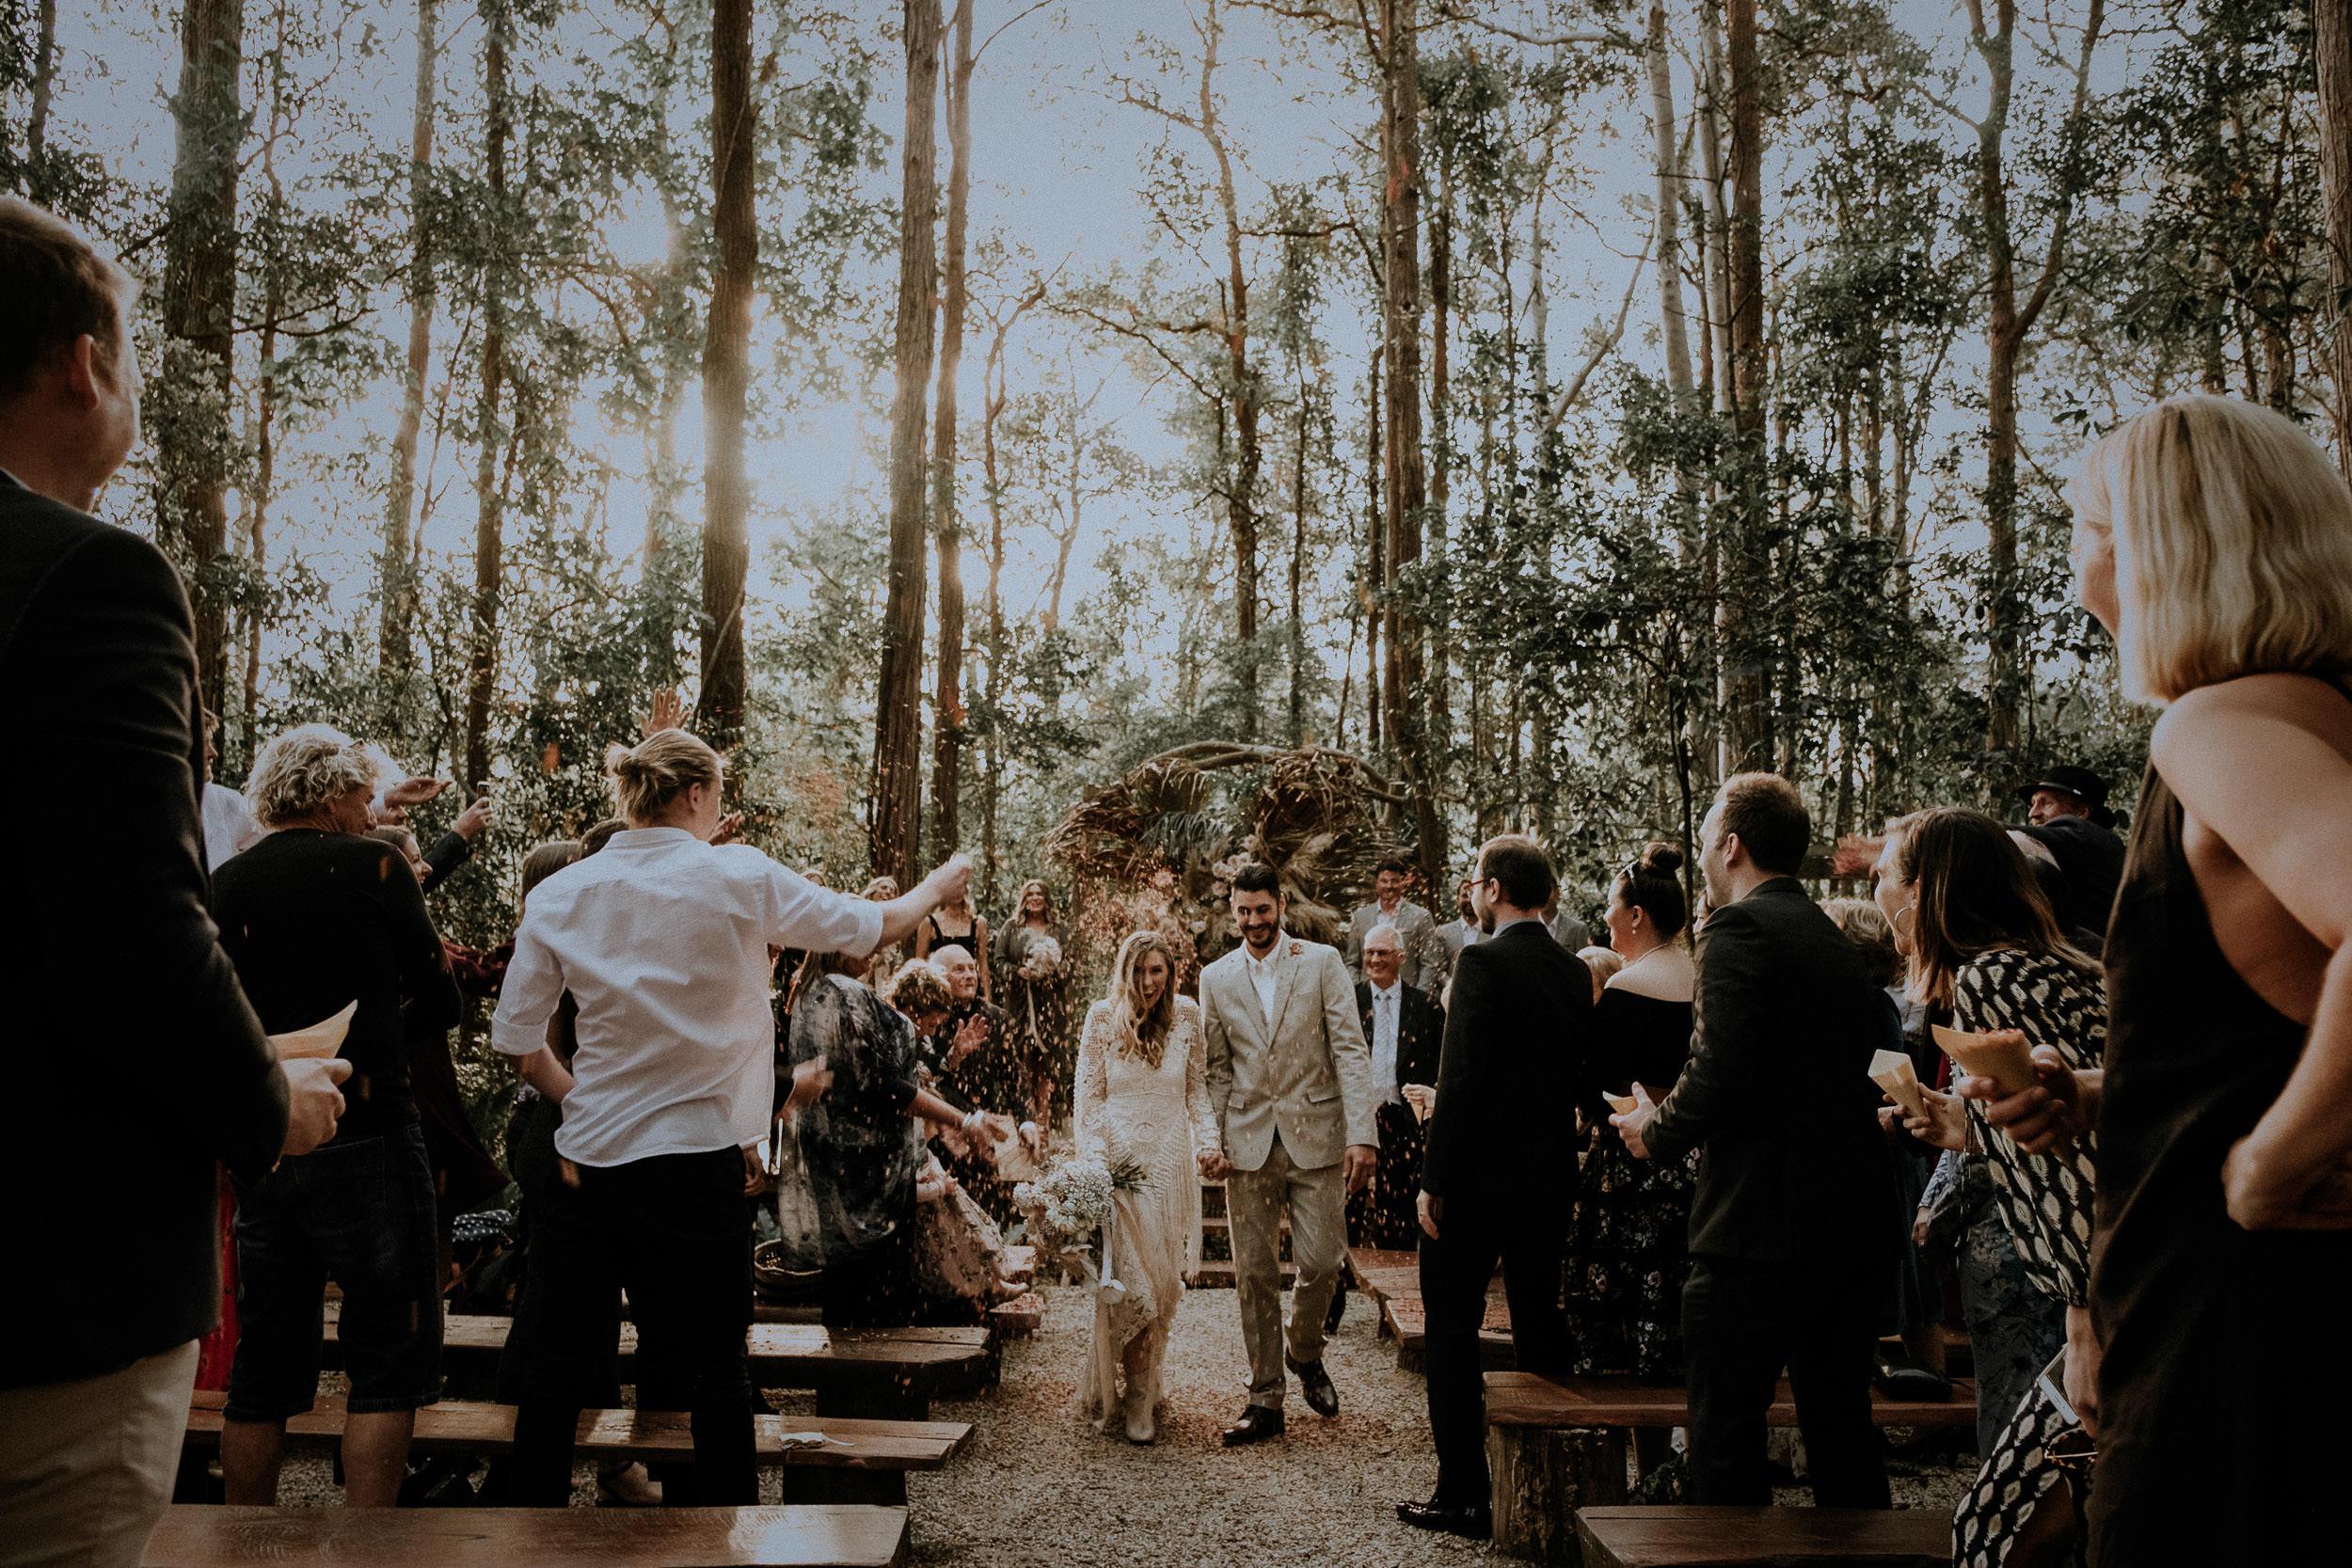 S&A Elopement - Kings & Thieves - Shred 'Til Dead - Central Coast Beach Forest Wedding - 283.jpg